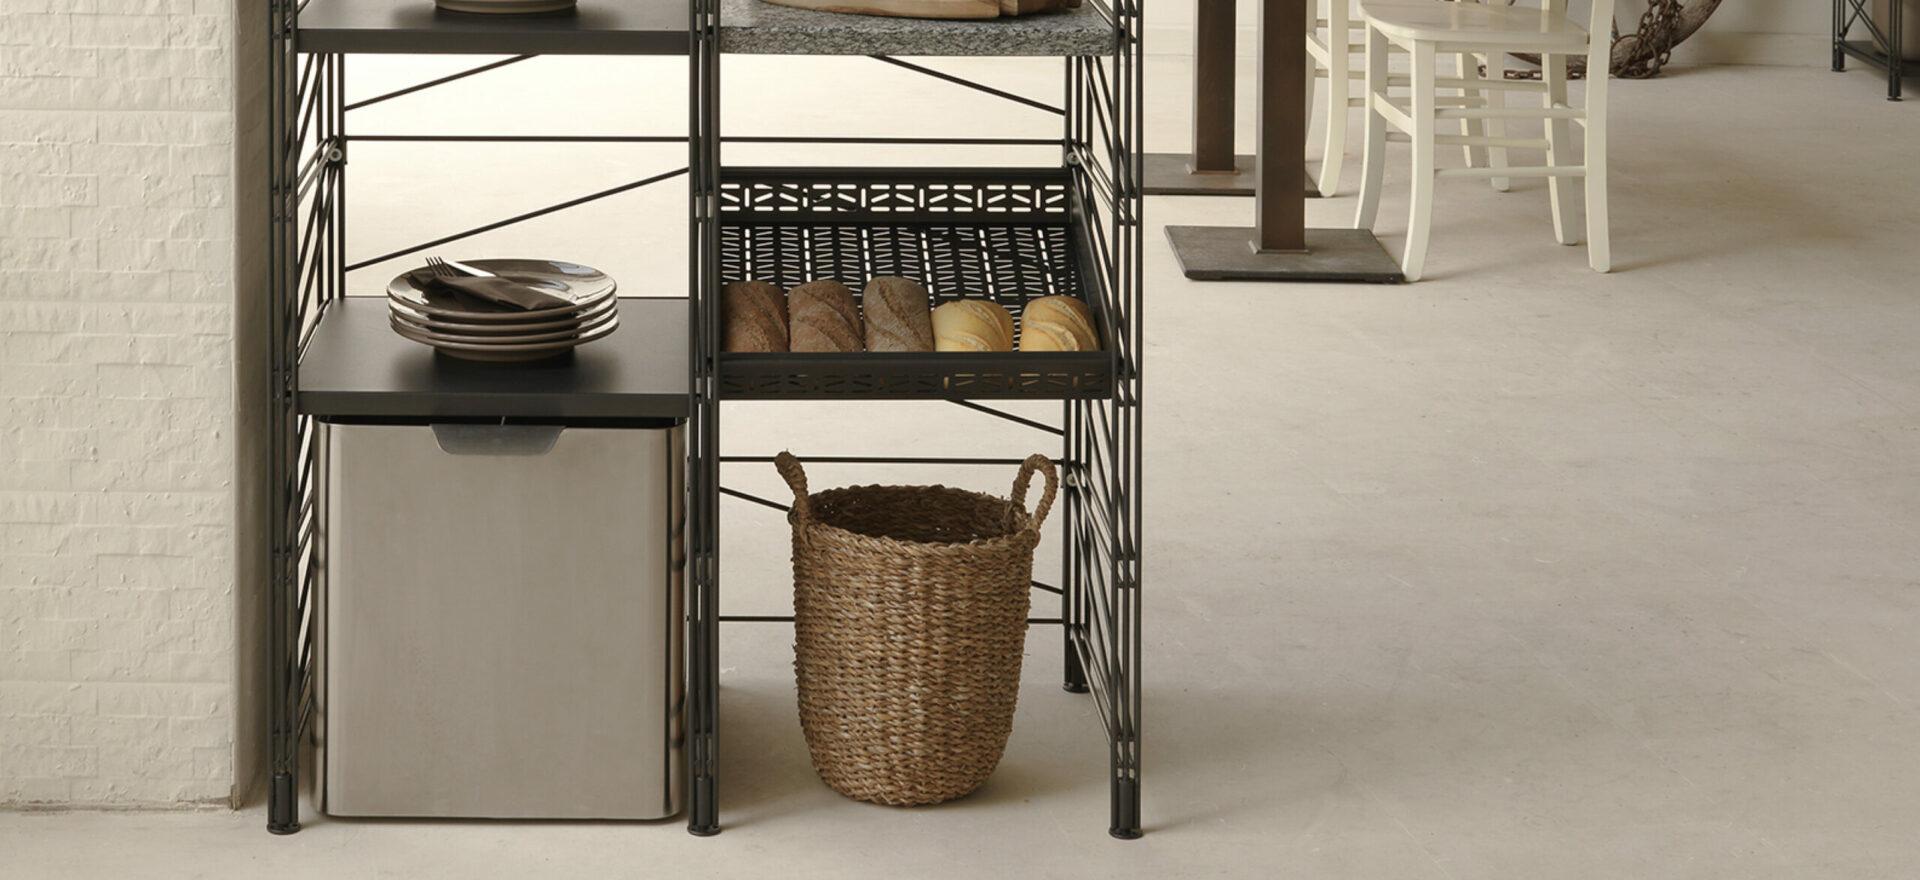 Socrate Outdoor_Outdoor Furniture_Caimi__Storage detailsMario Trimarchi Design